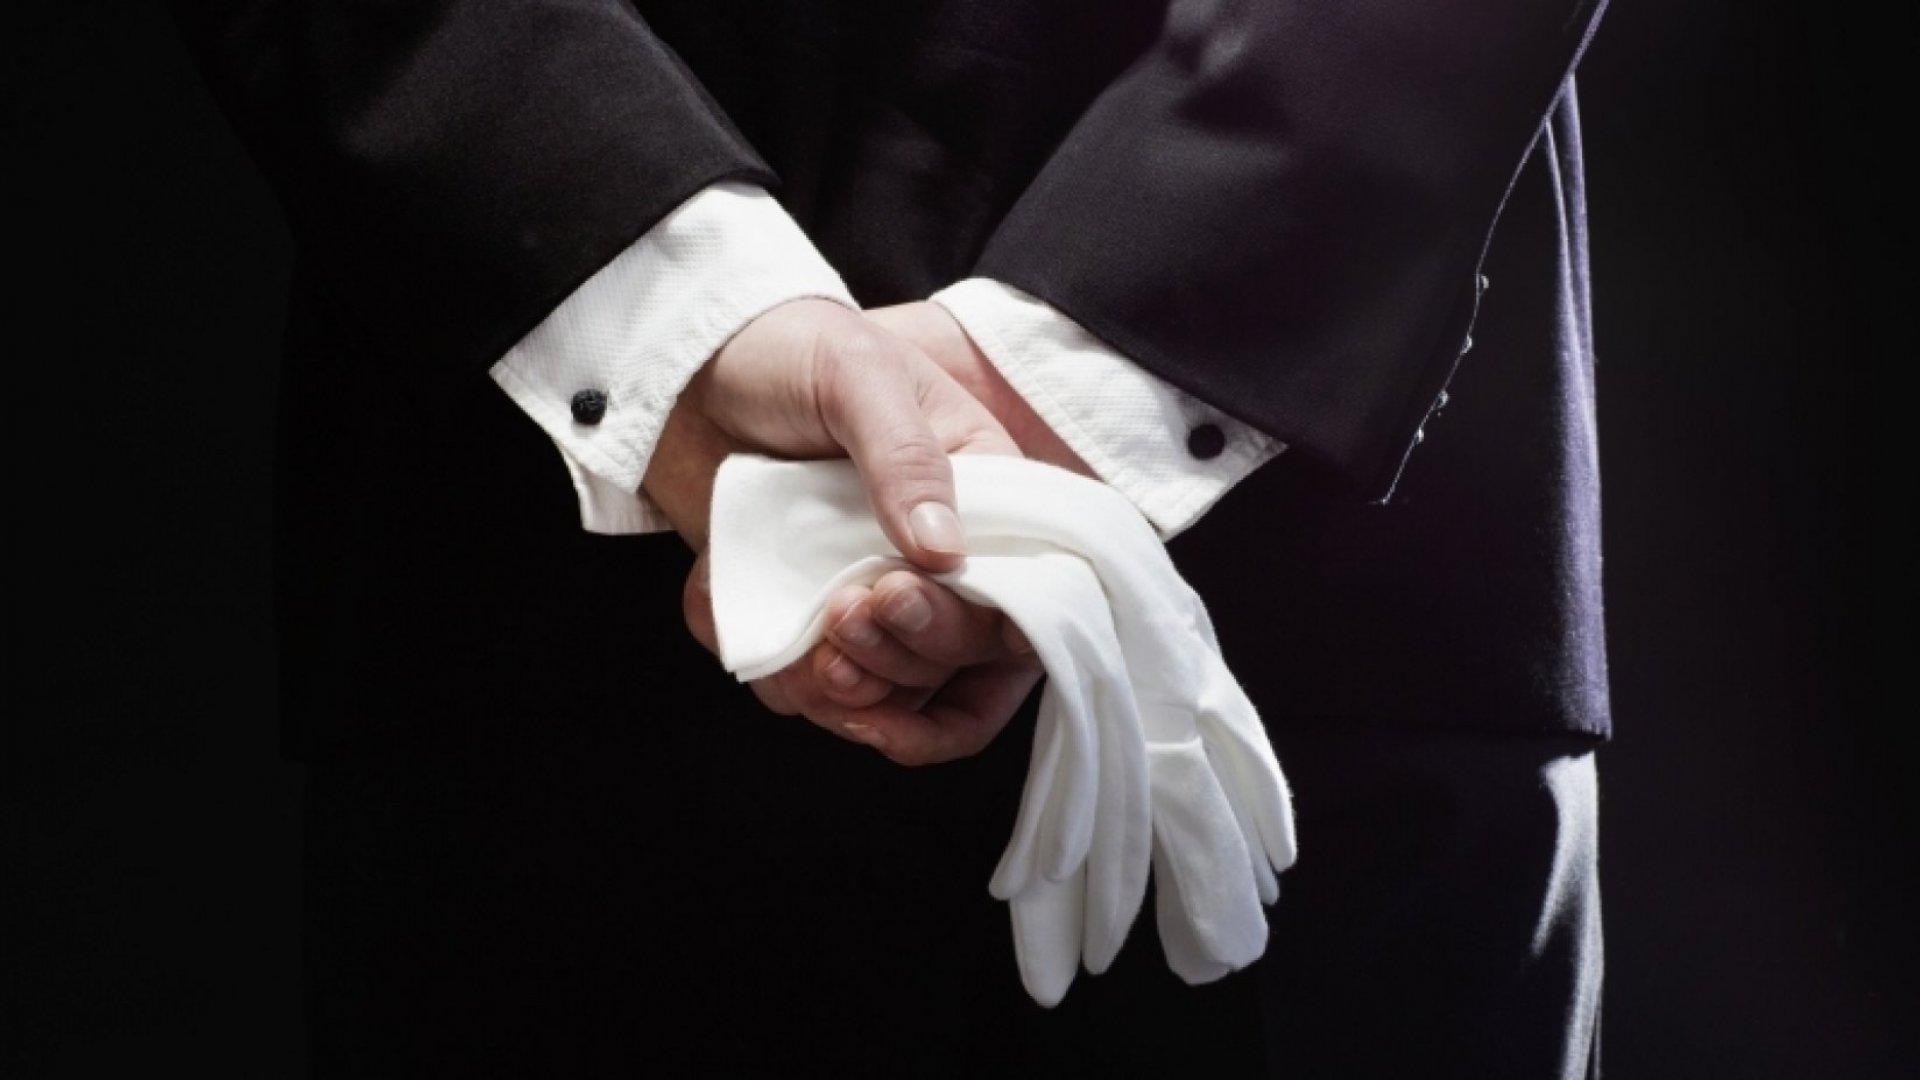 3 Keys to Amazing Customer Service